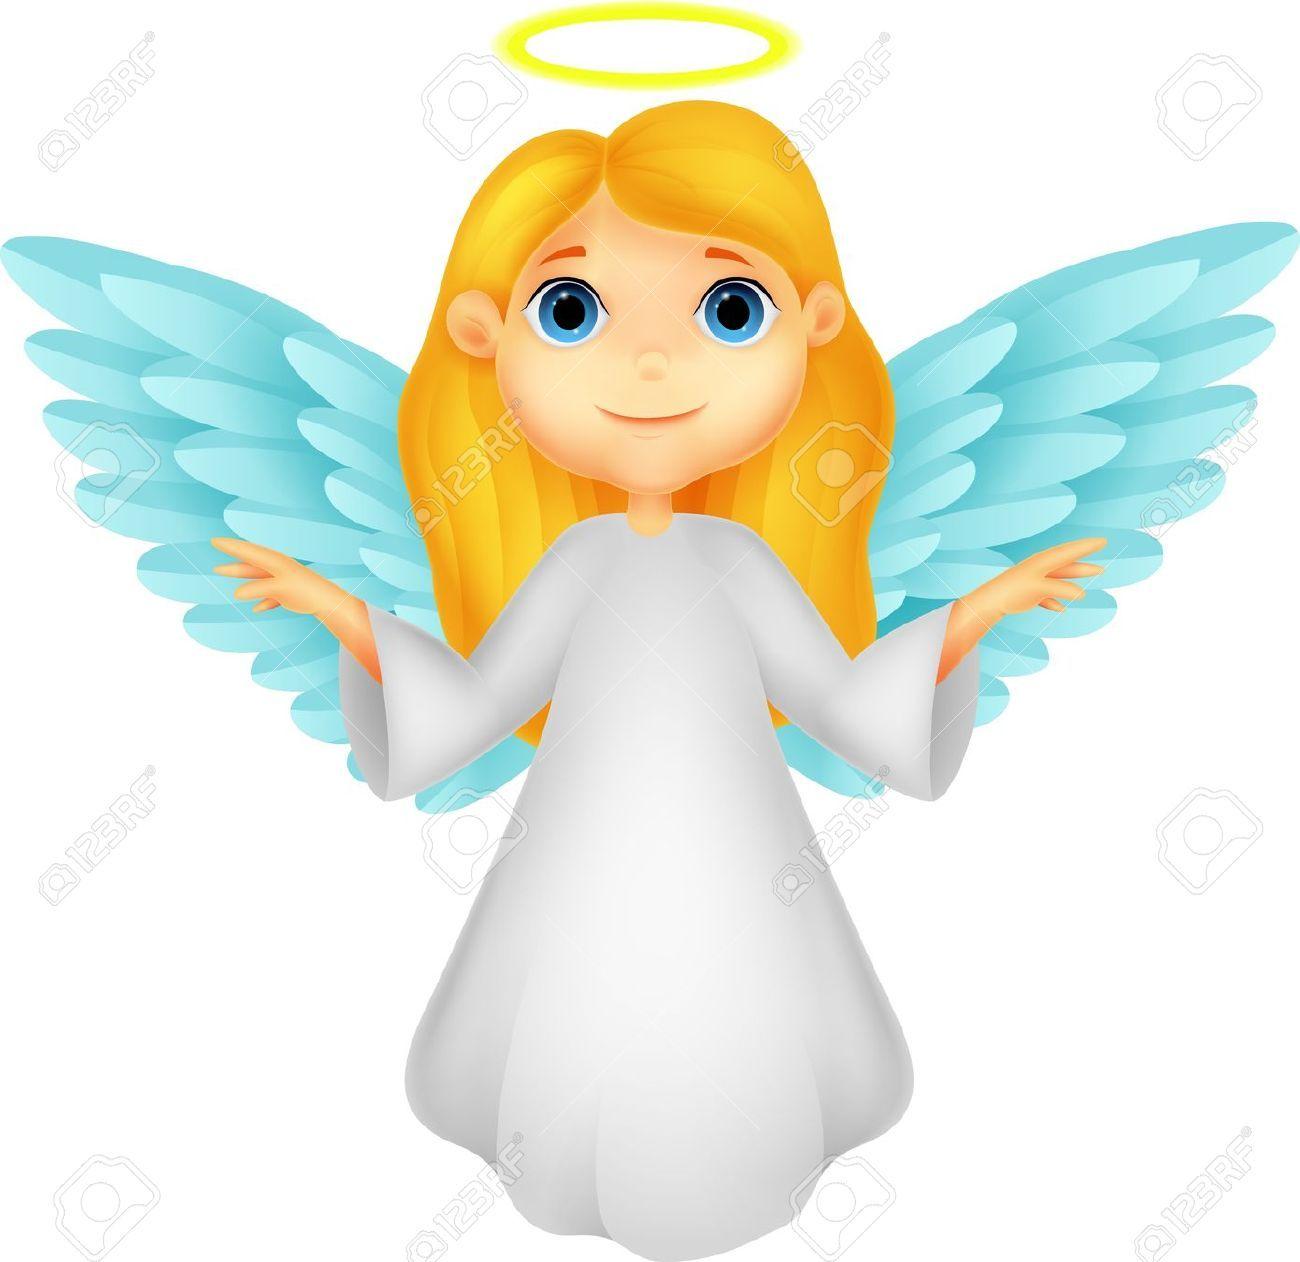 Cartoon Angels Images Google Search Angel Cartoon Cartoons Vector Angel Pictures